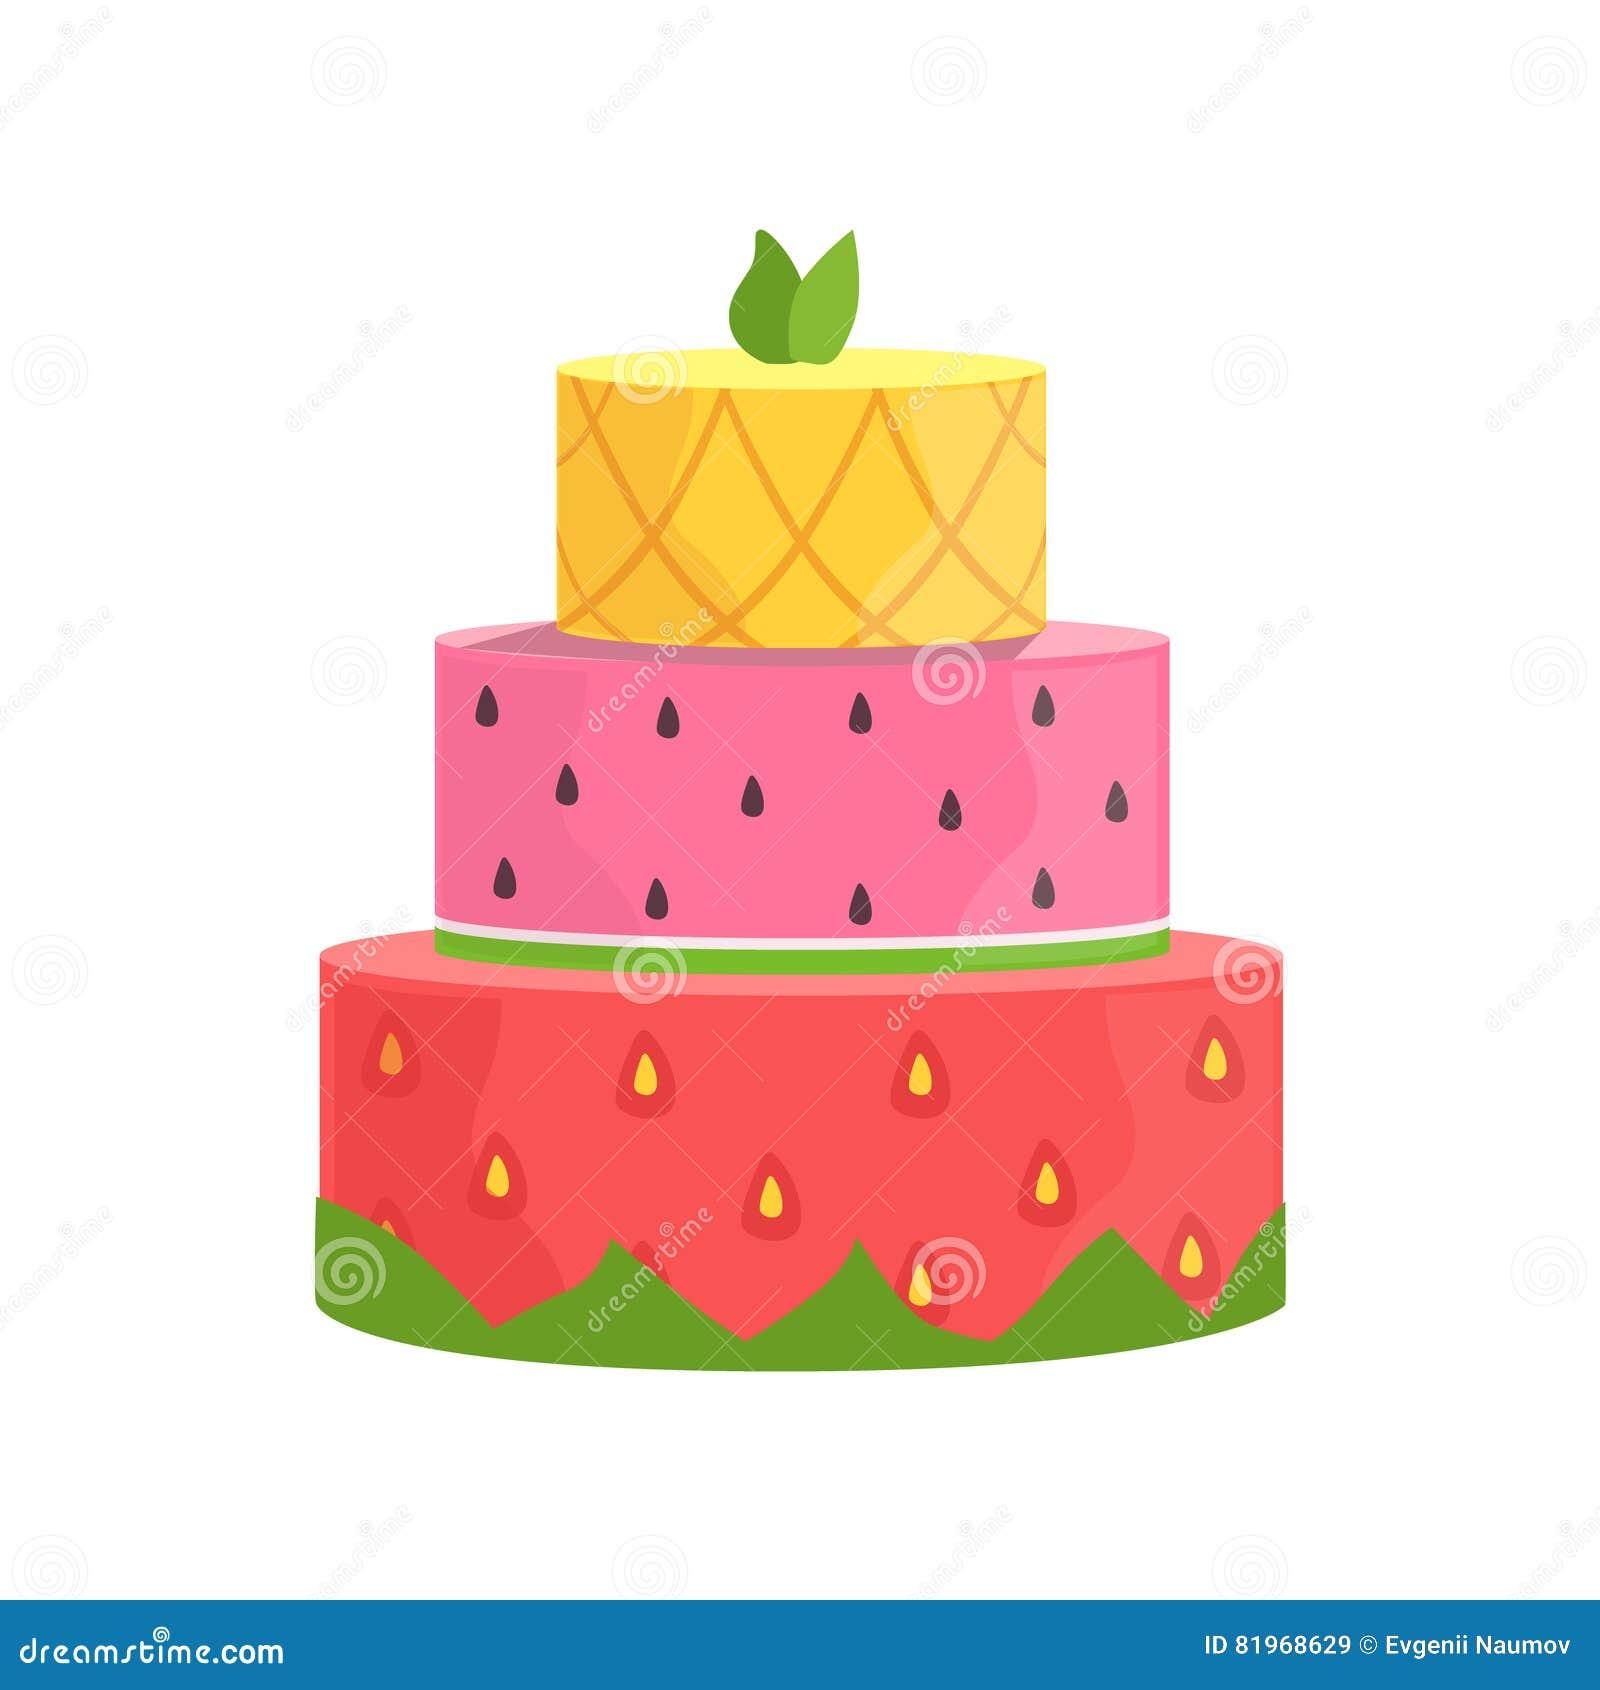 Three Layered Cake With Strawberry Watermelon And